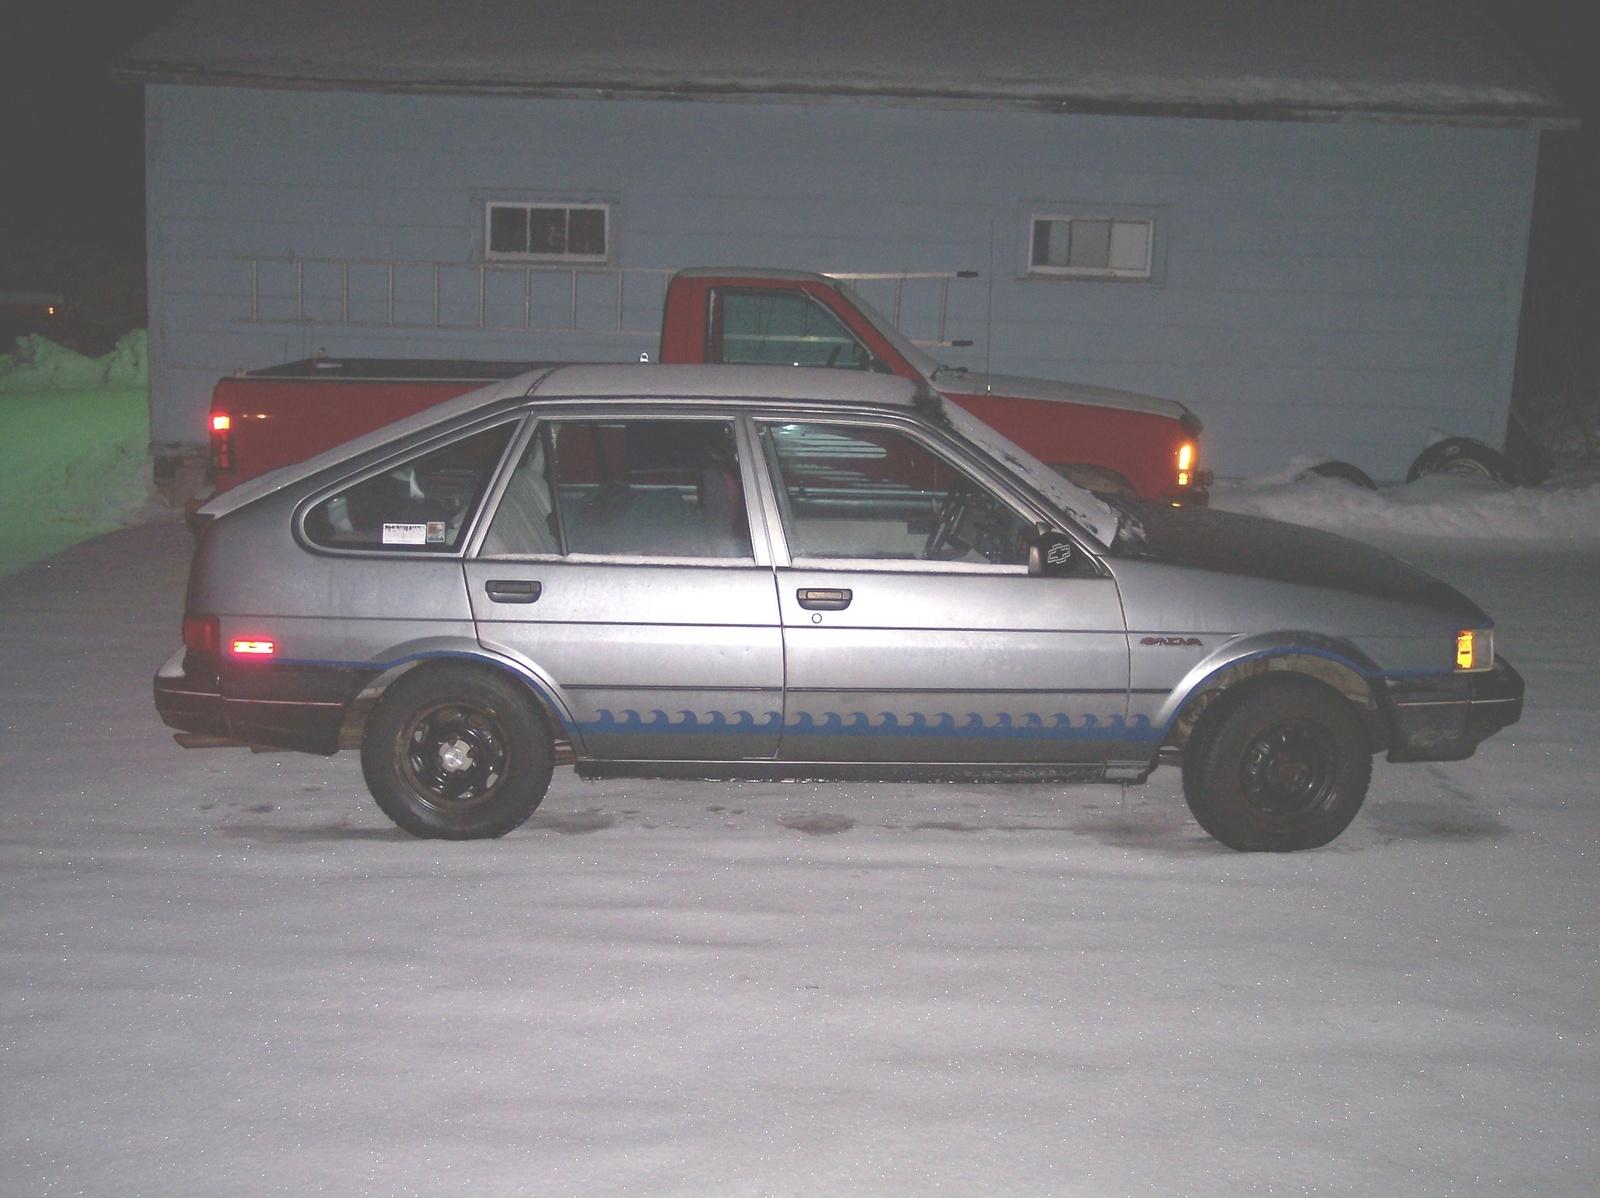 1988 Chevrolet Nova - Overview - CarGurus